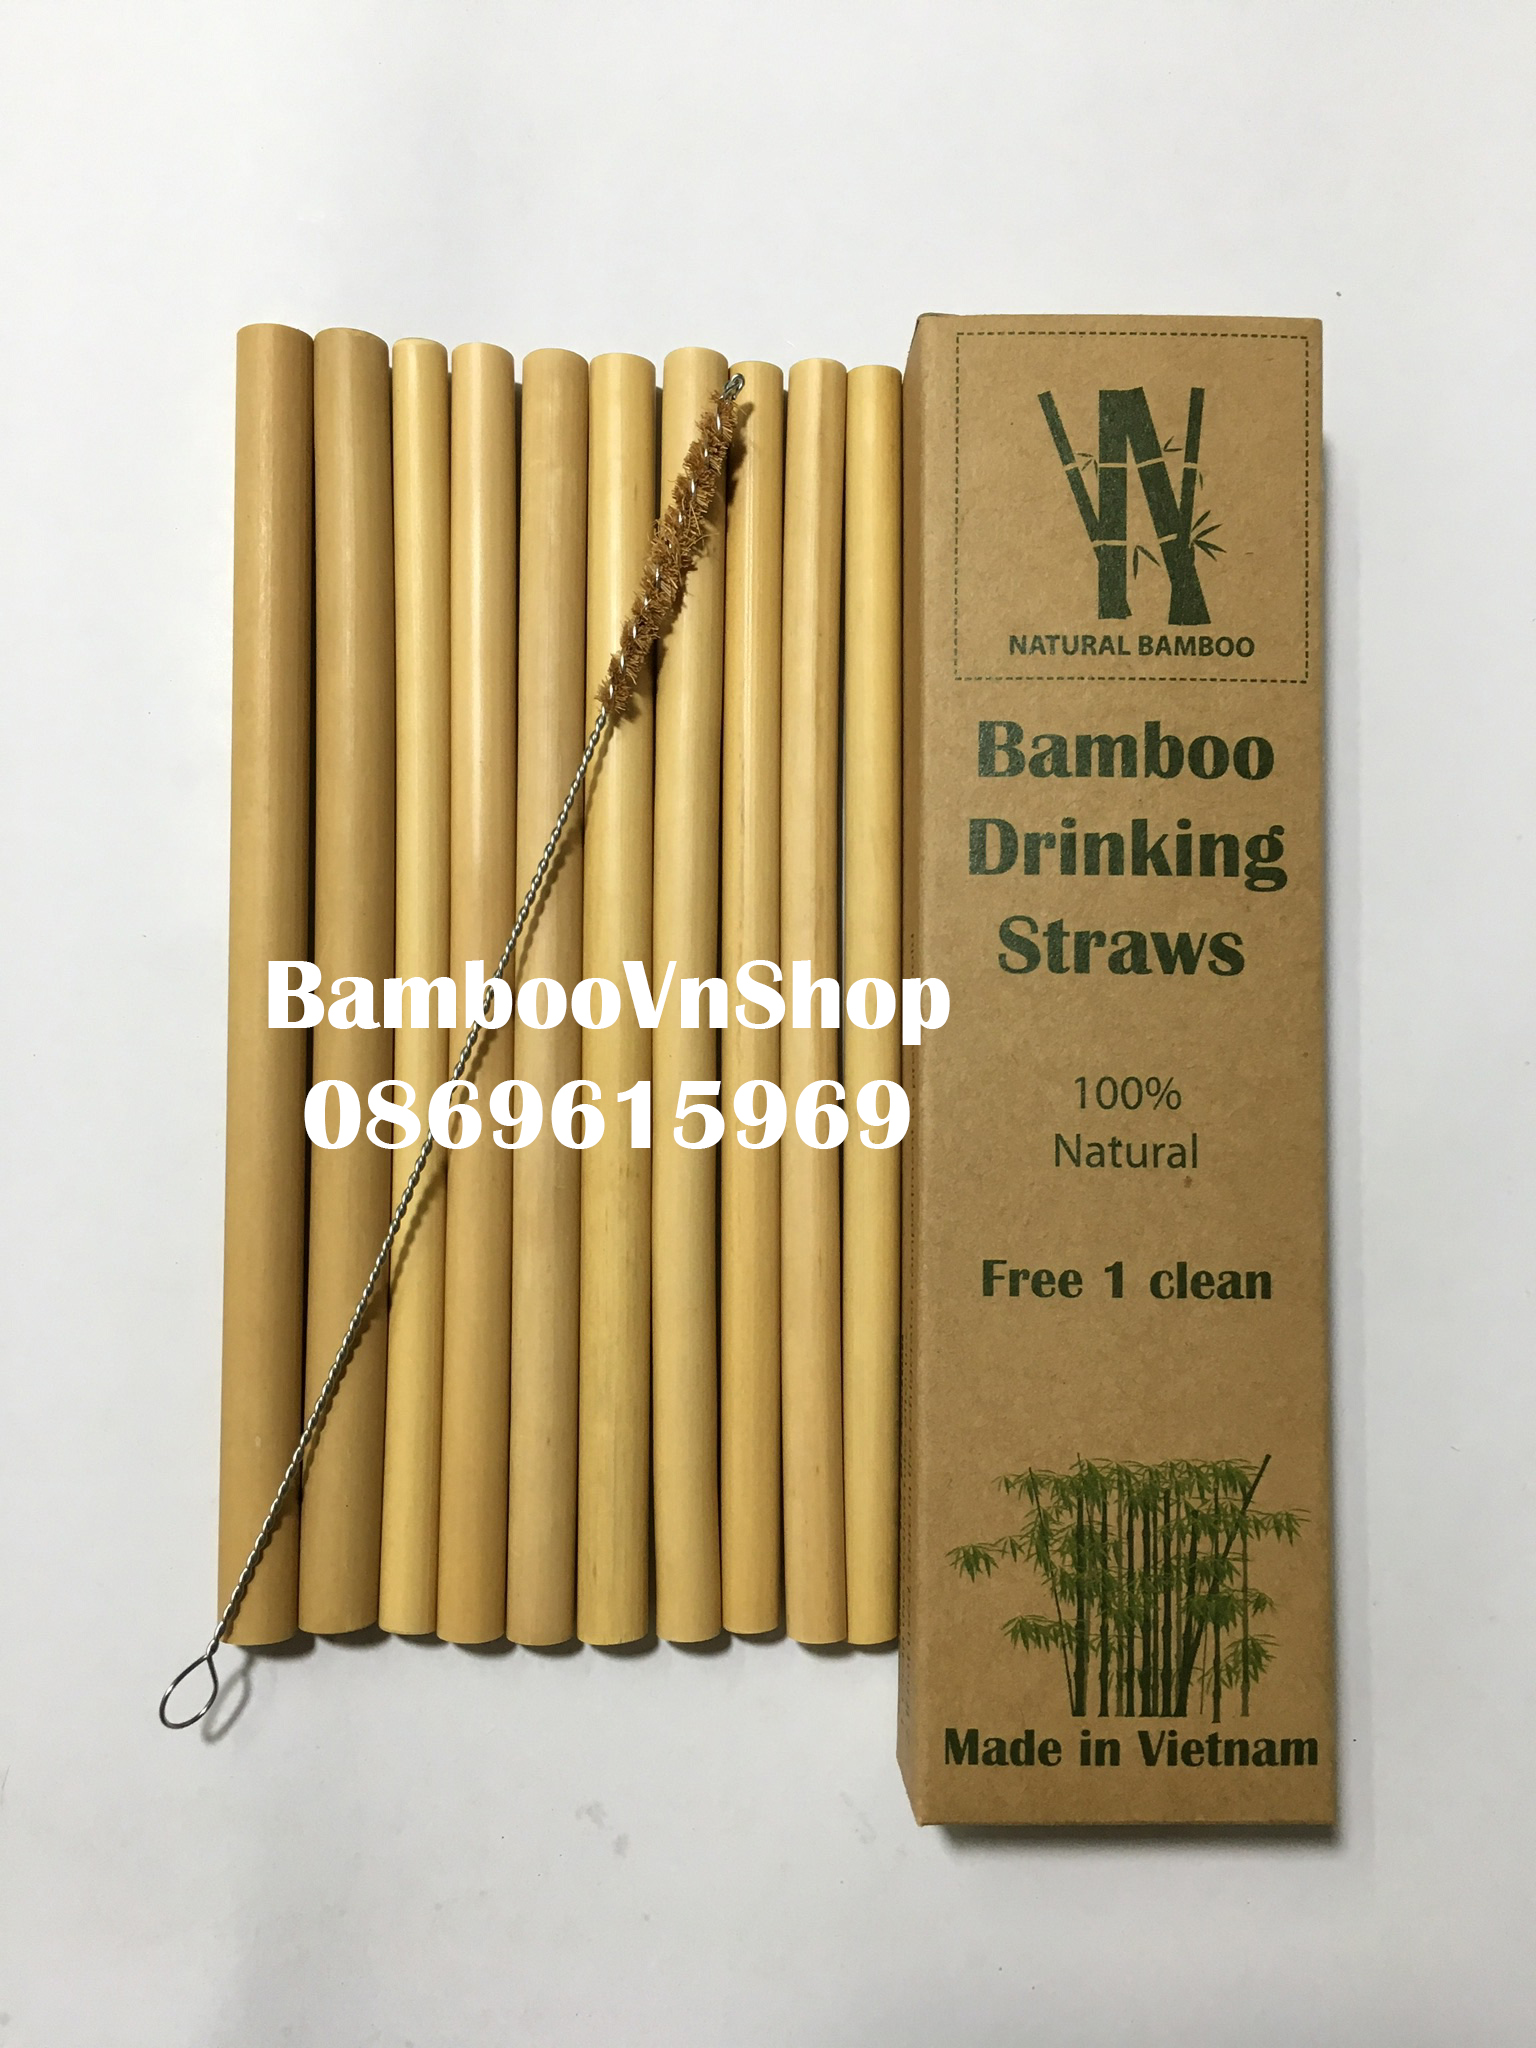 BamboovnShop